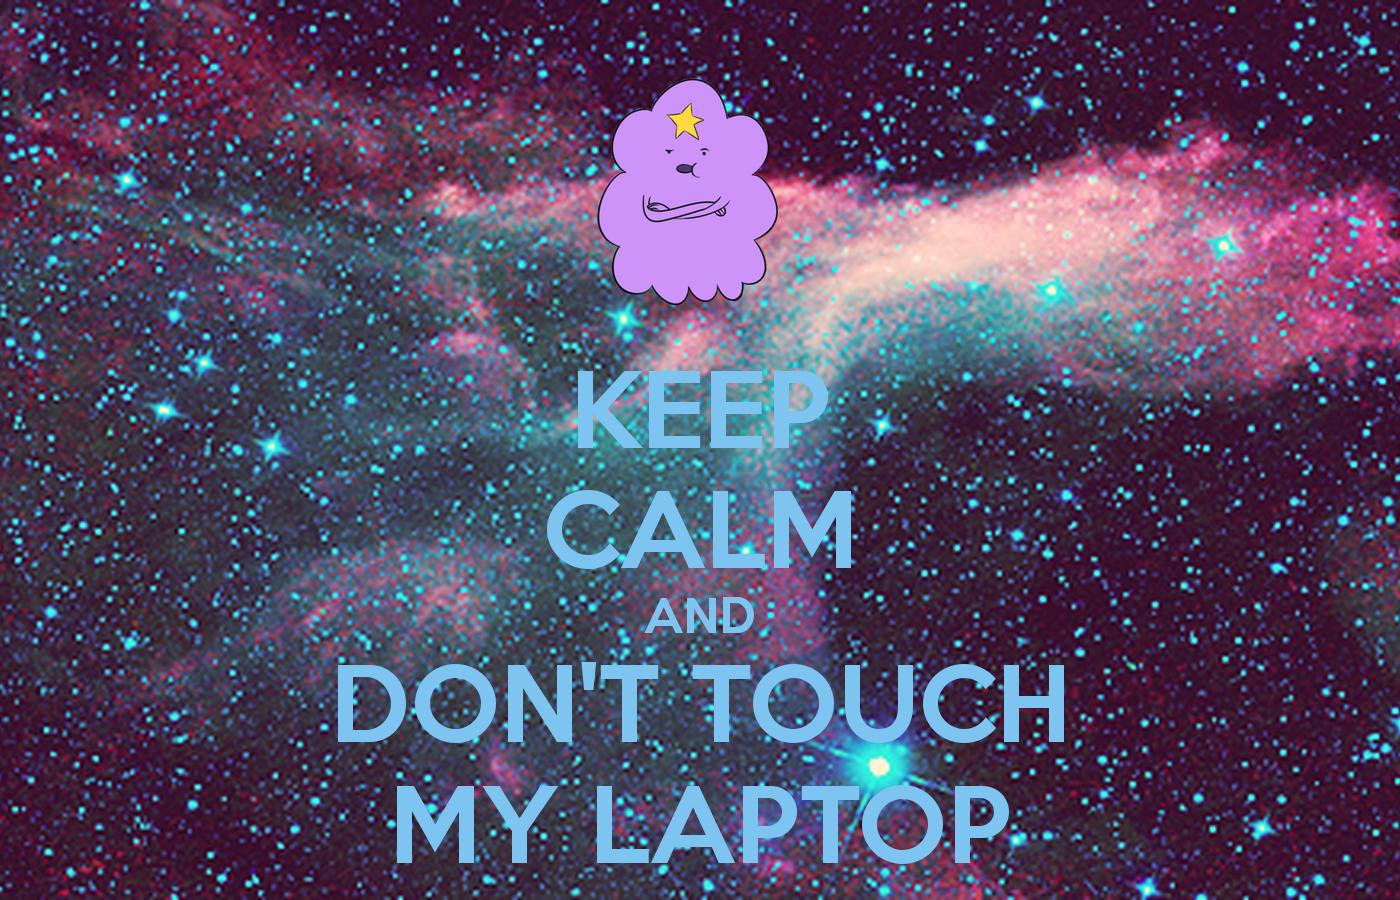 Don T Touch My Computer Wallpaper Wallpapersafari